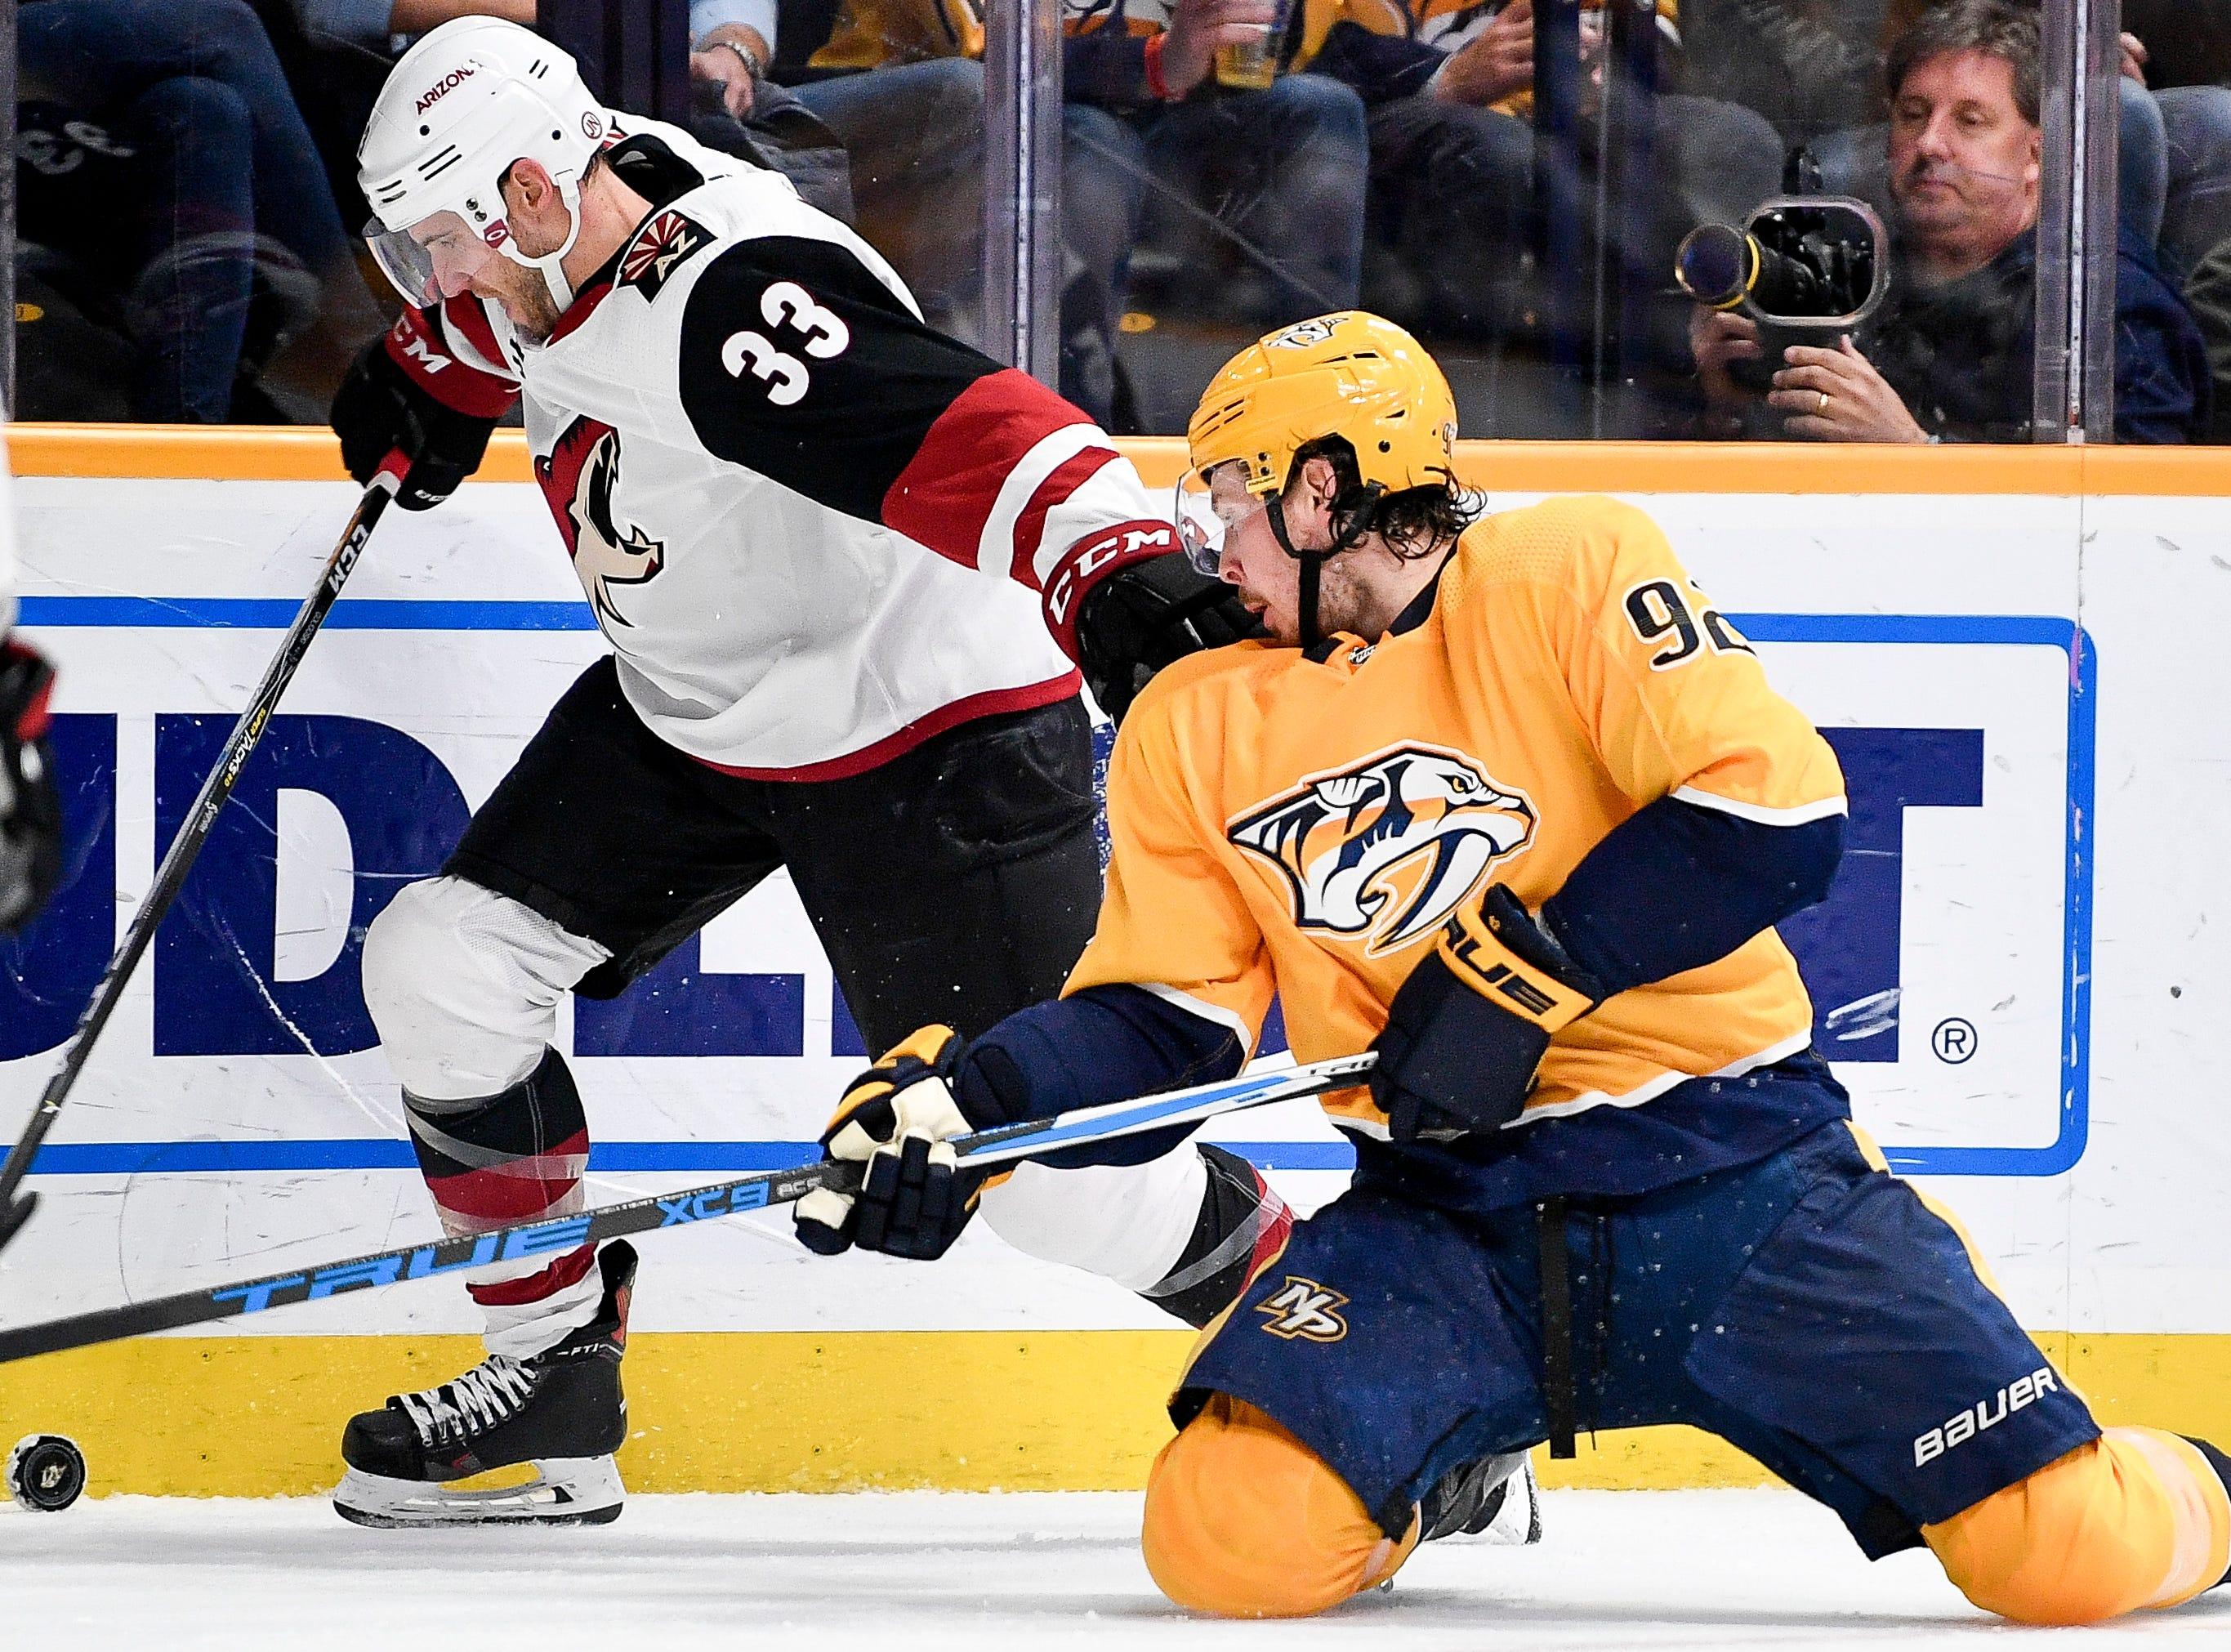 Arizona Coyotes goaltender Calvin Pickard (33) battles Nashville Predators center Ryan Johansen (92) during the third period at Bridgestone Arena in Nashville, Tenn., Thursday, Nov. 29, 2018.